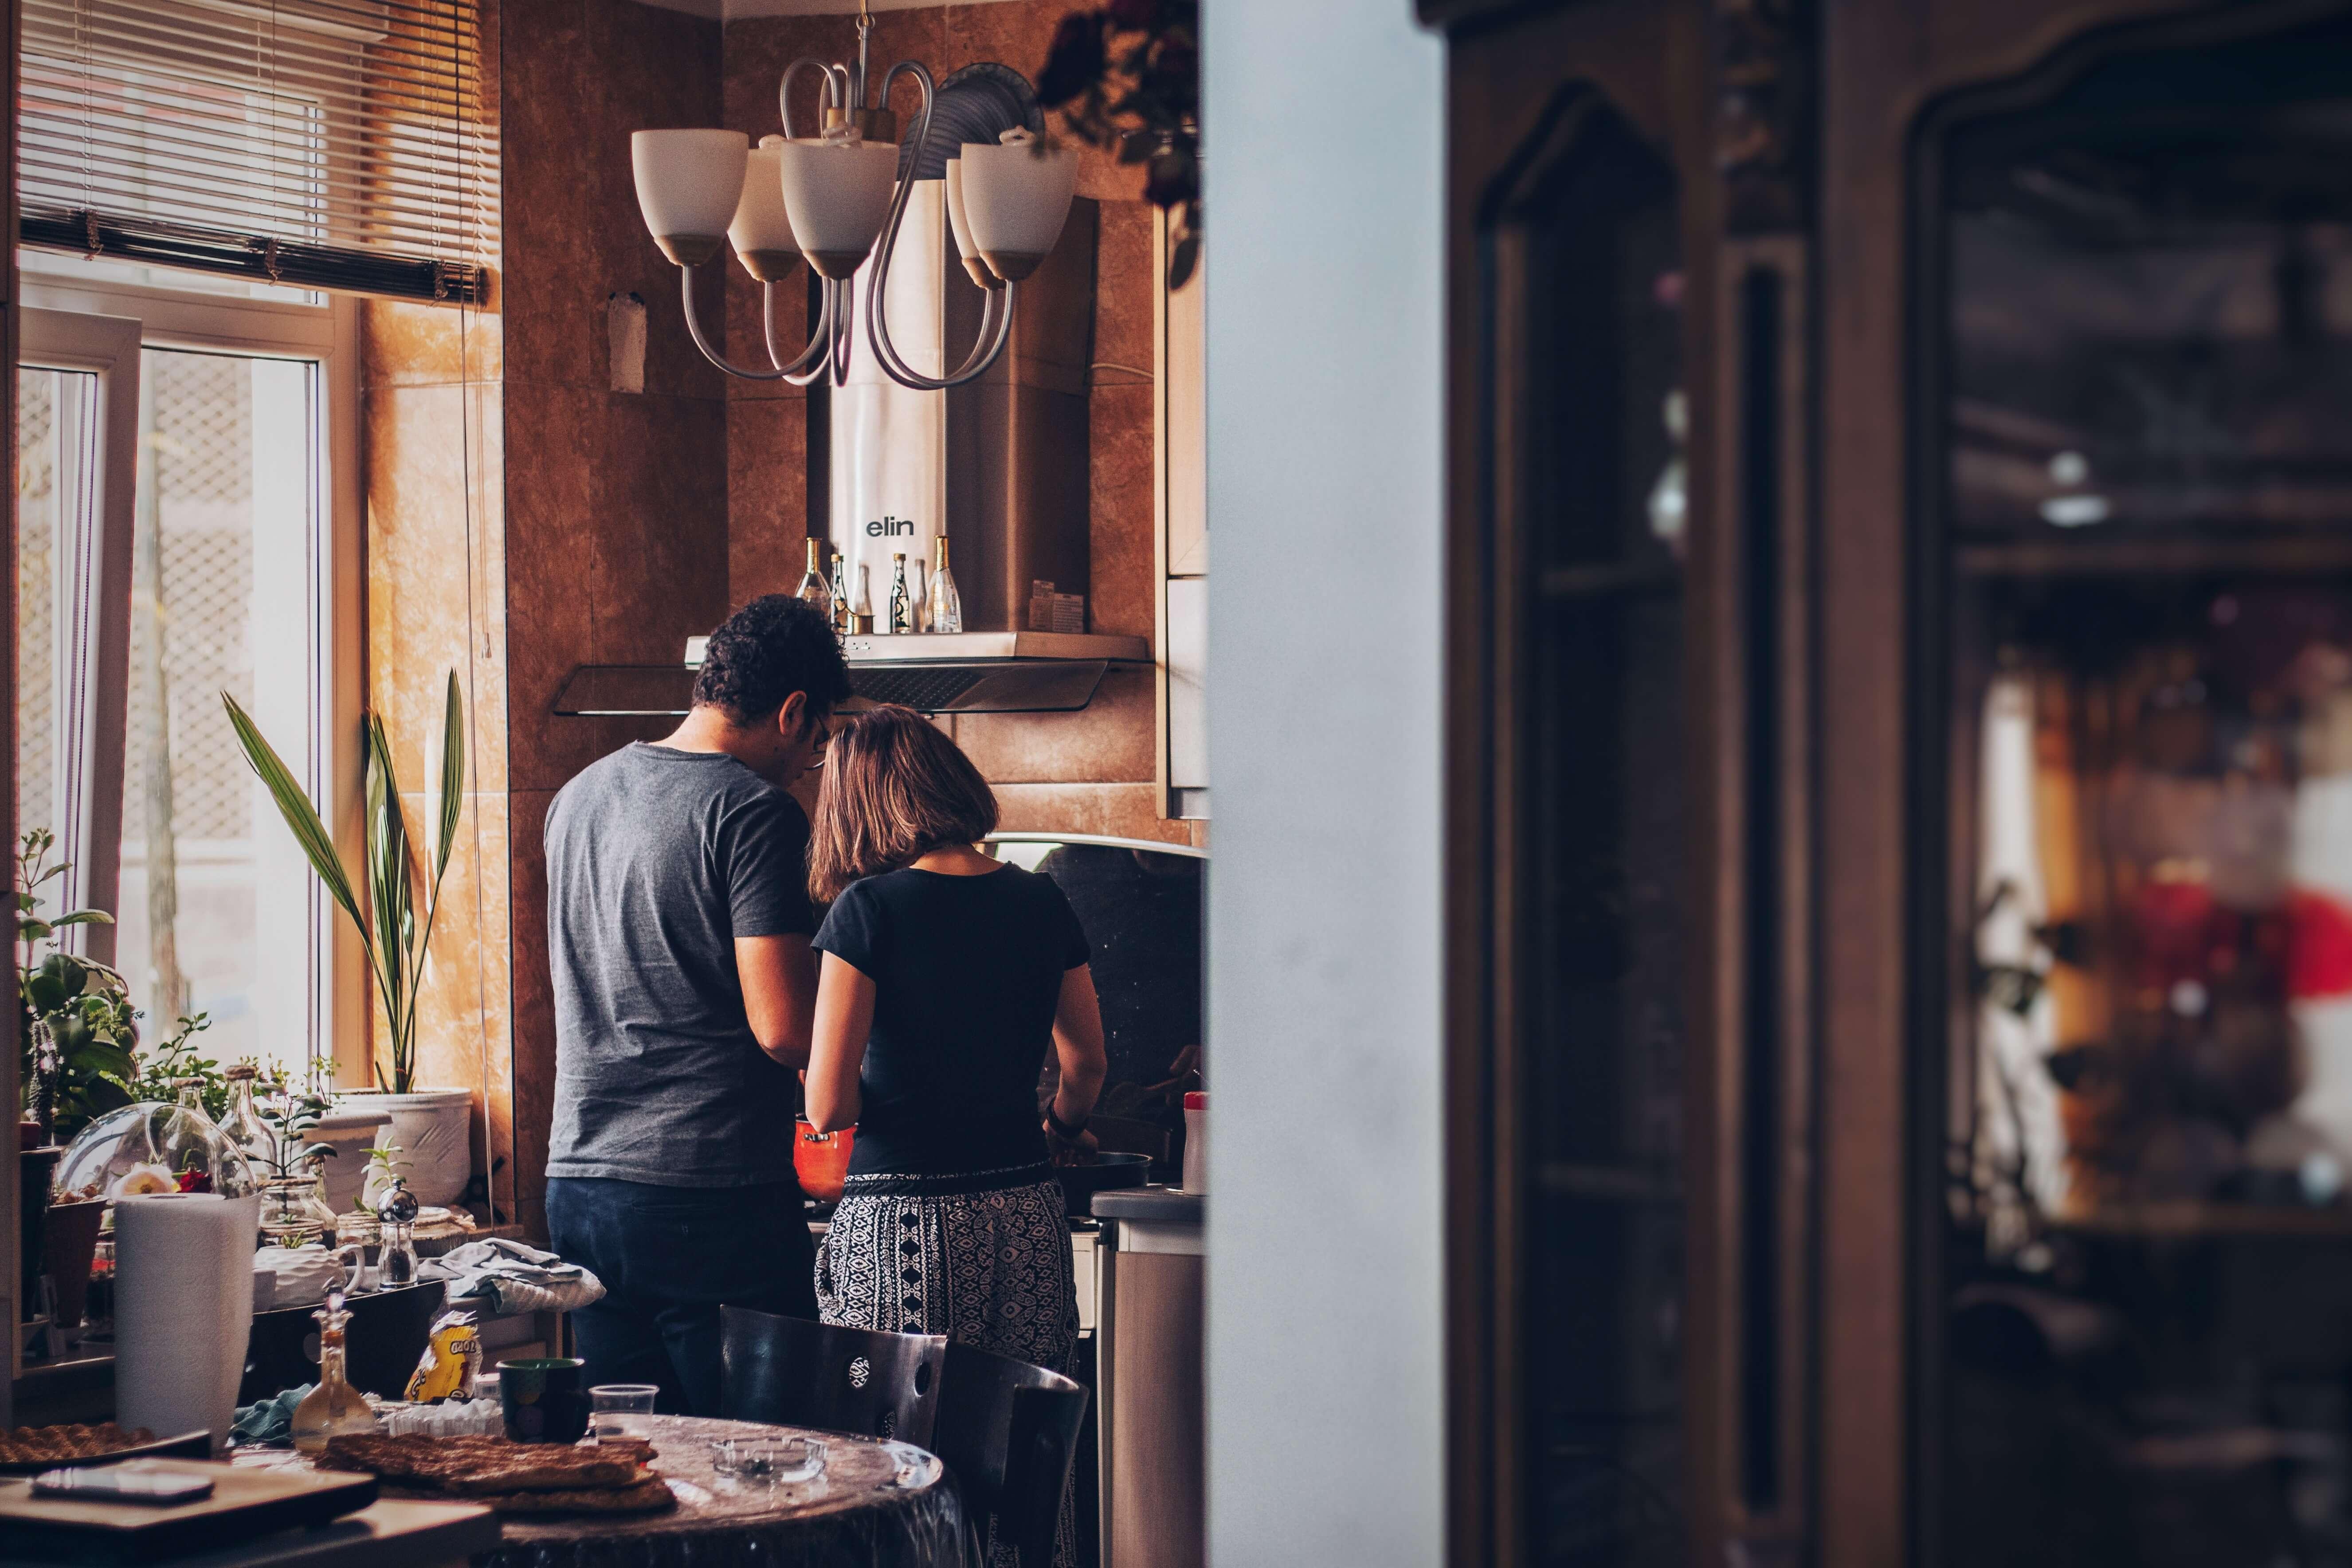 cuisine recette couple vegan